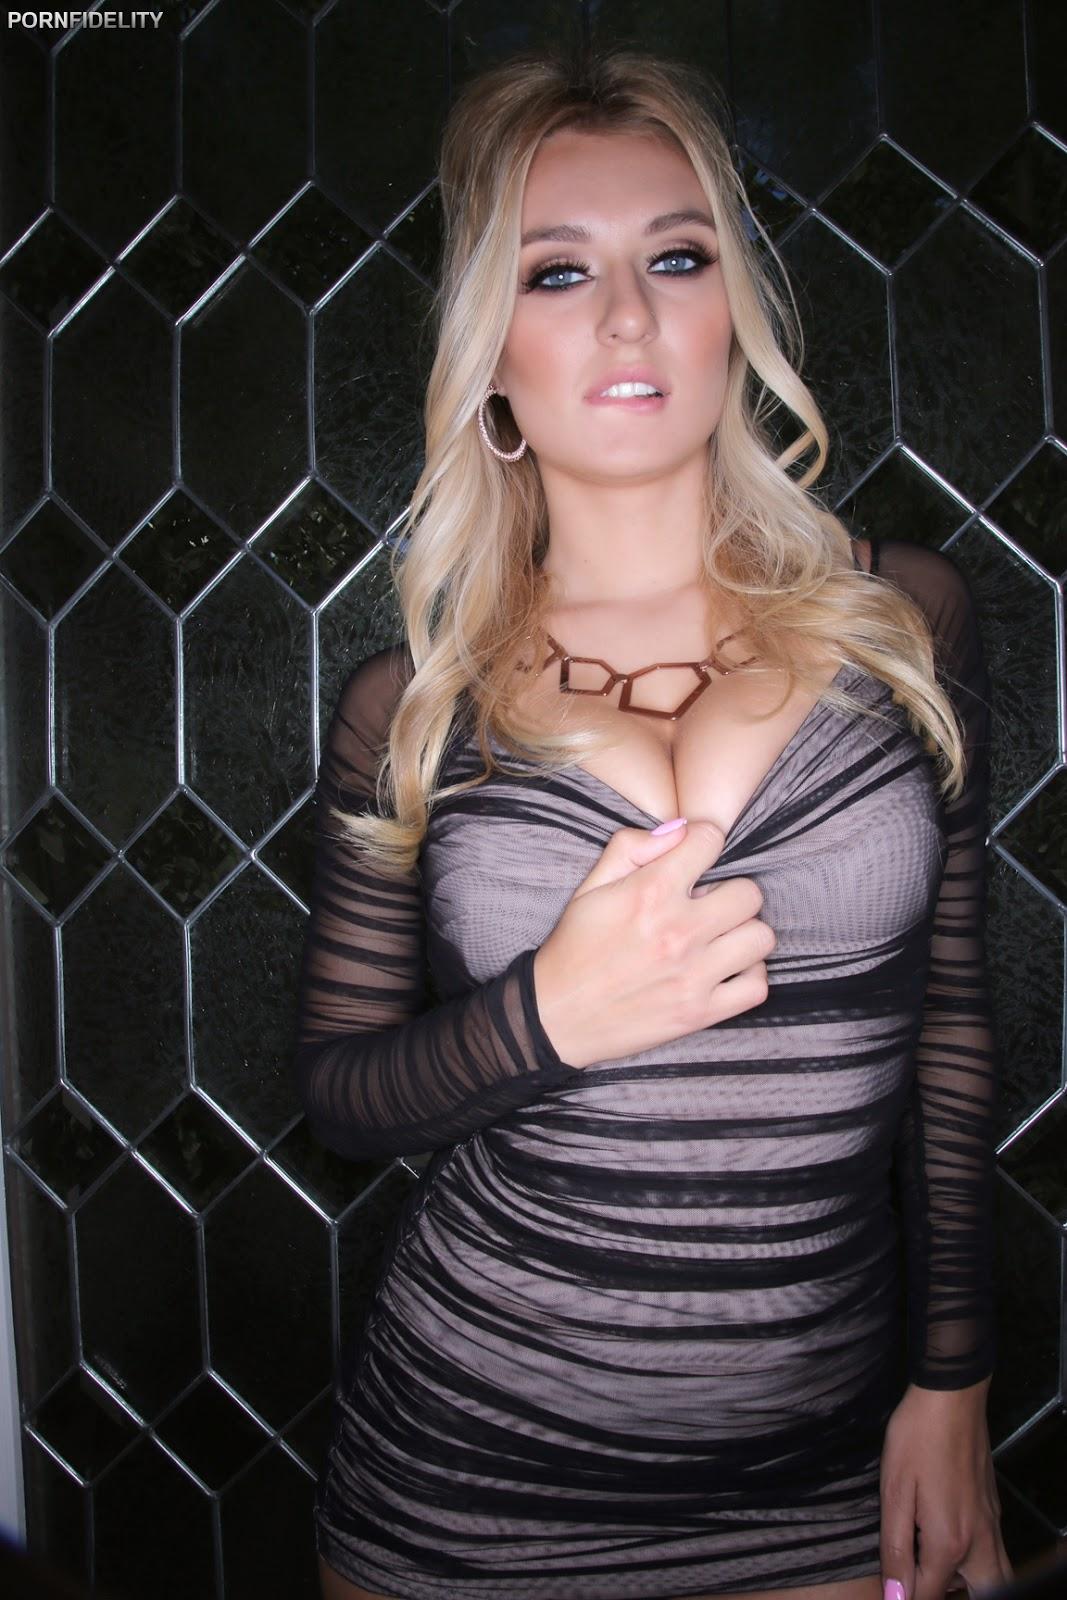 pornoen español natalia star